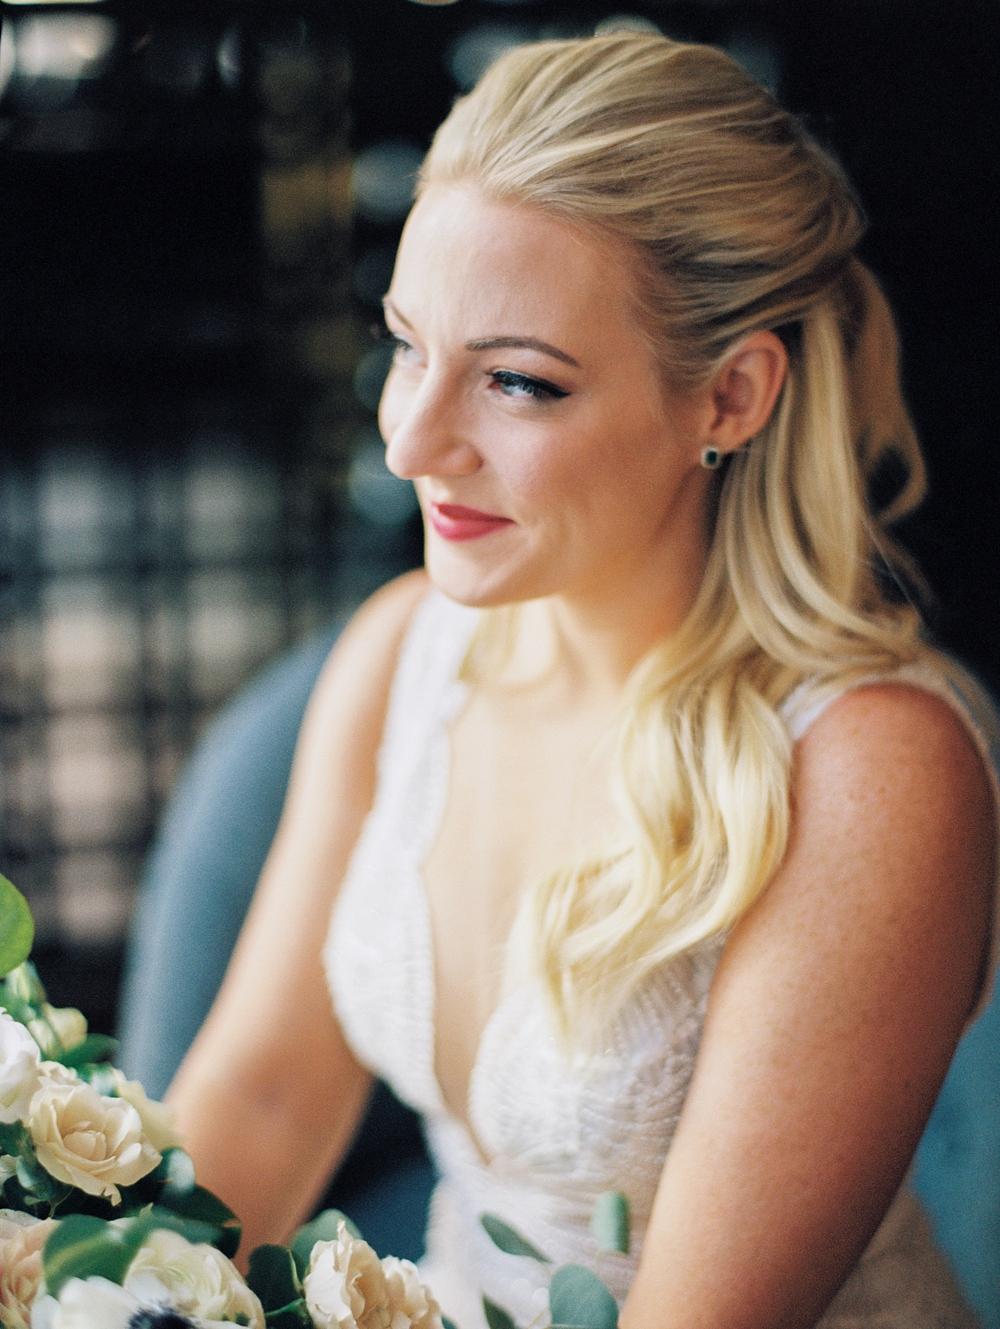 kristin-la-voie-photography-chicago-Wedding-Photographer-kimpton-gray-hotel-140